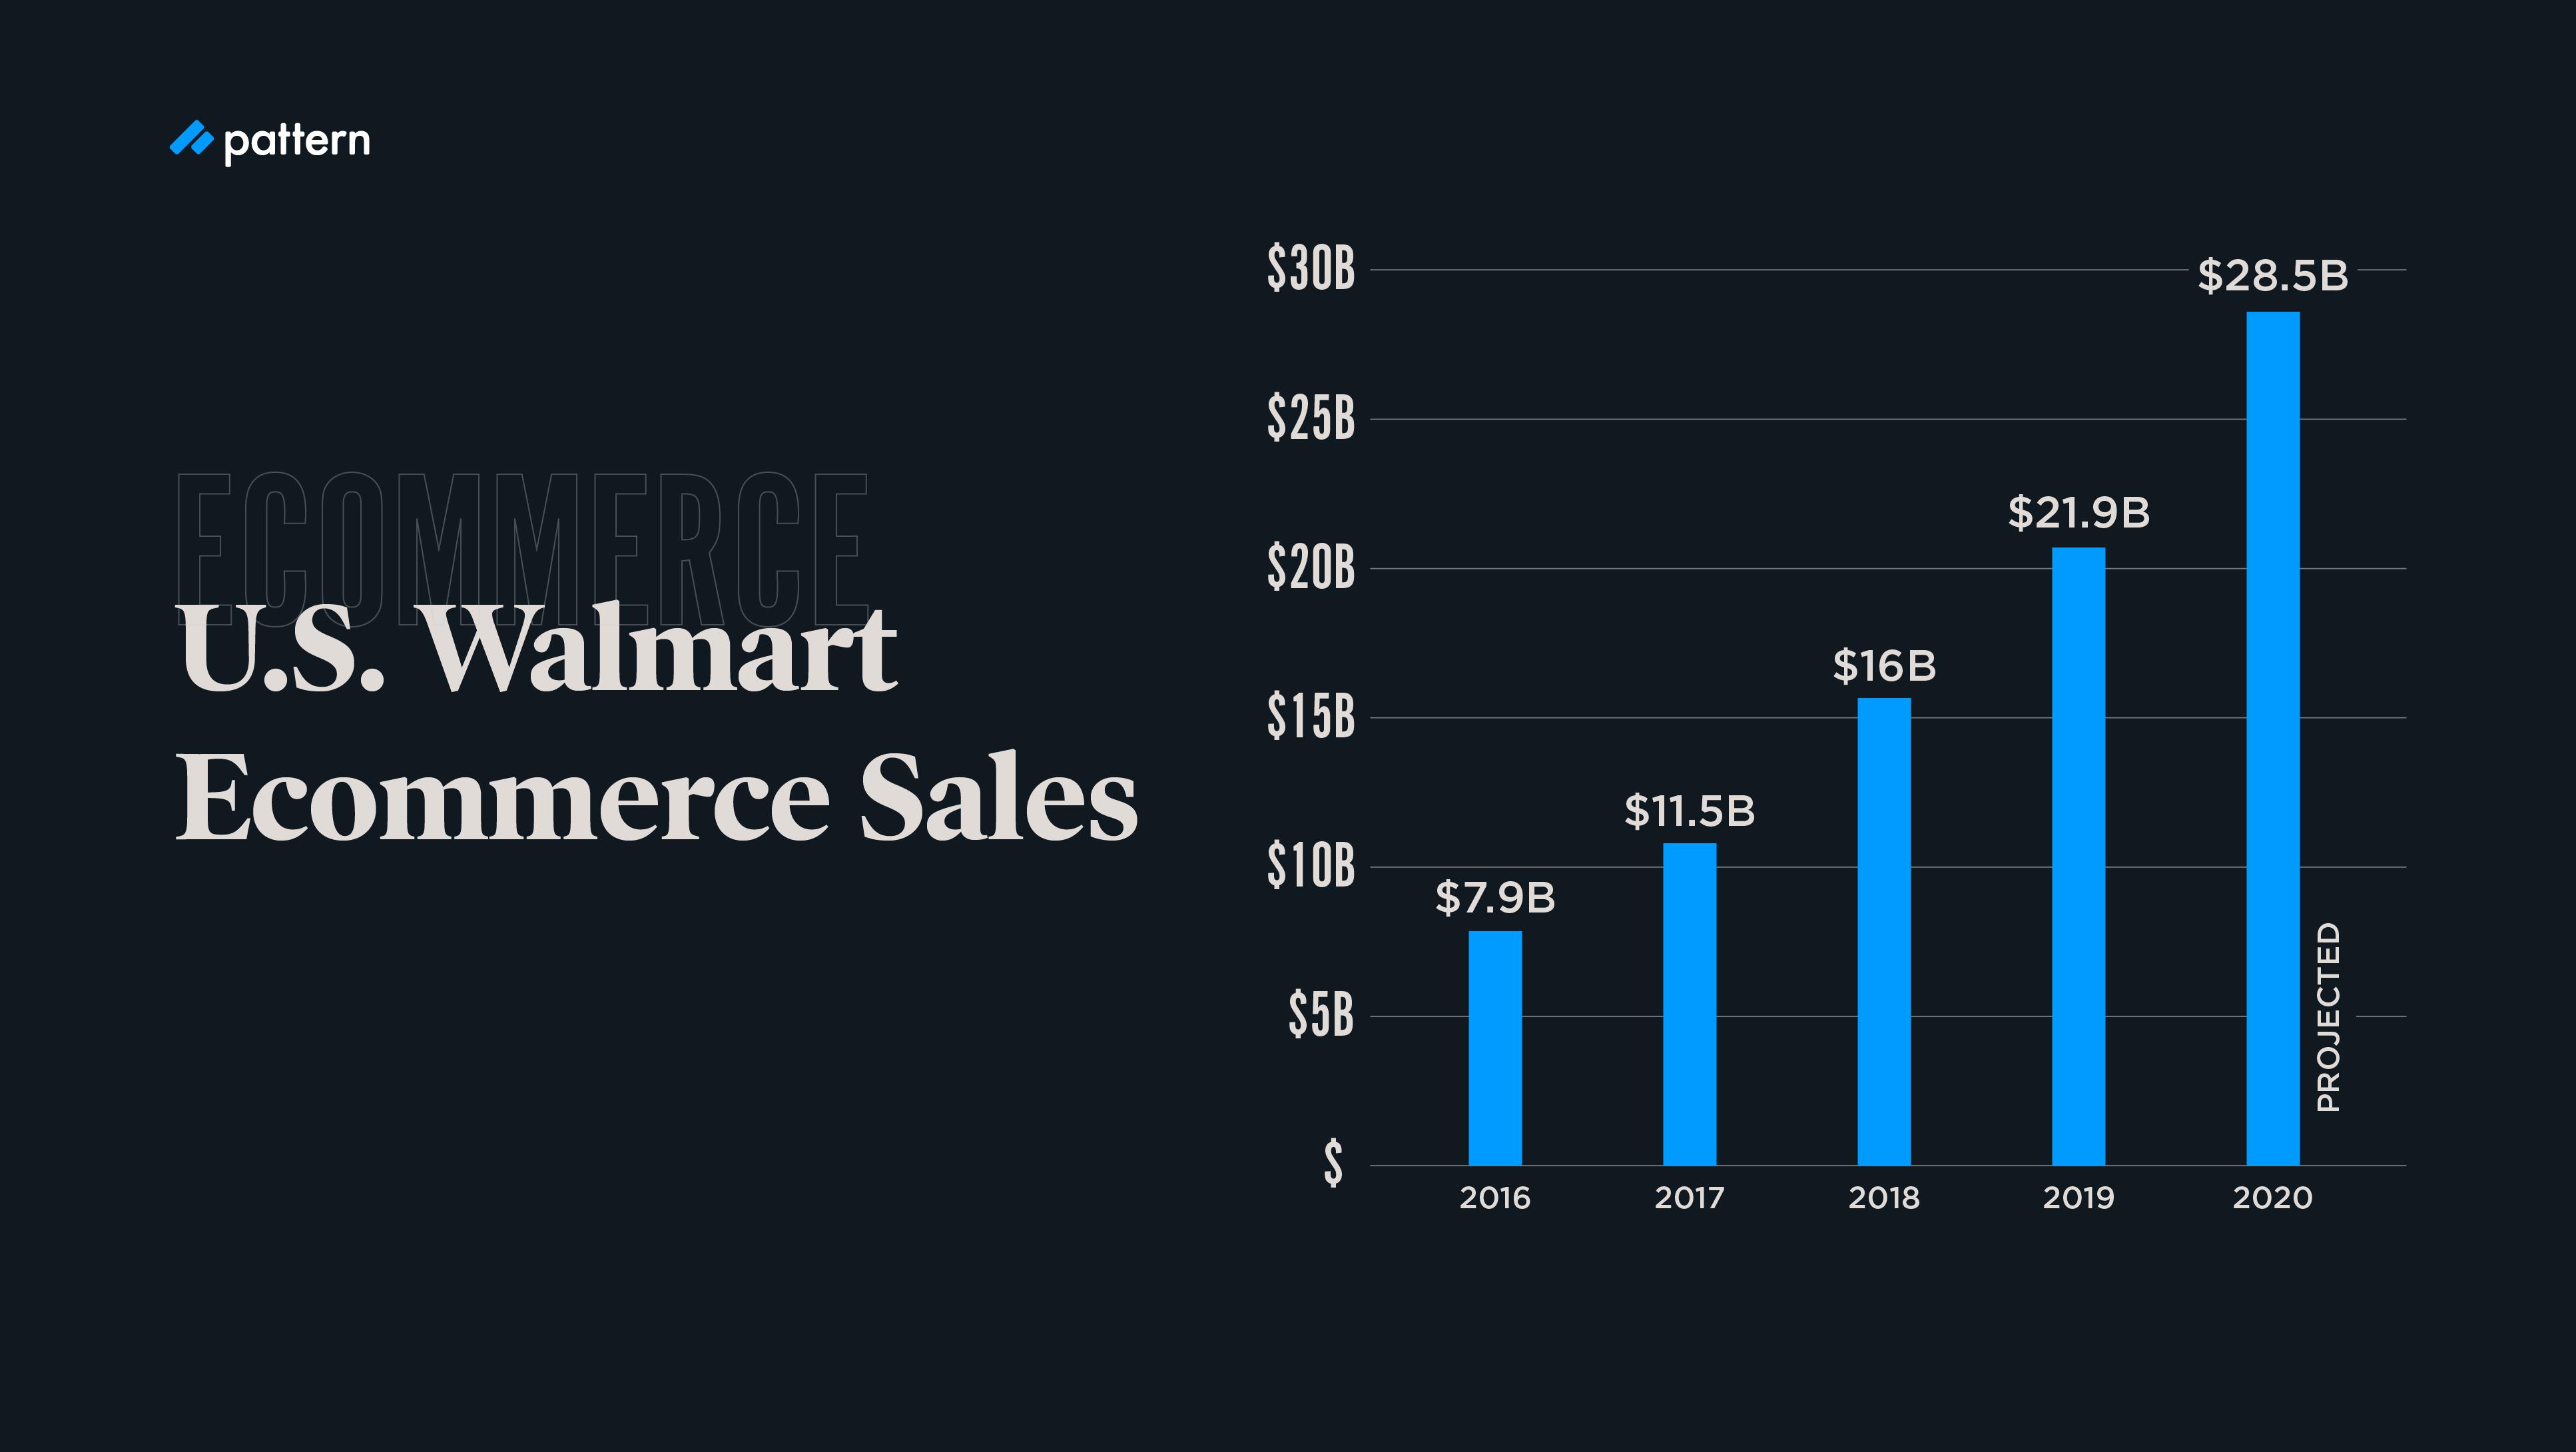 U.S Walmart Ecommerce Sales